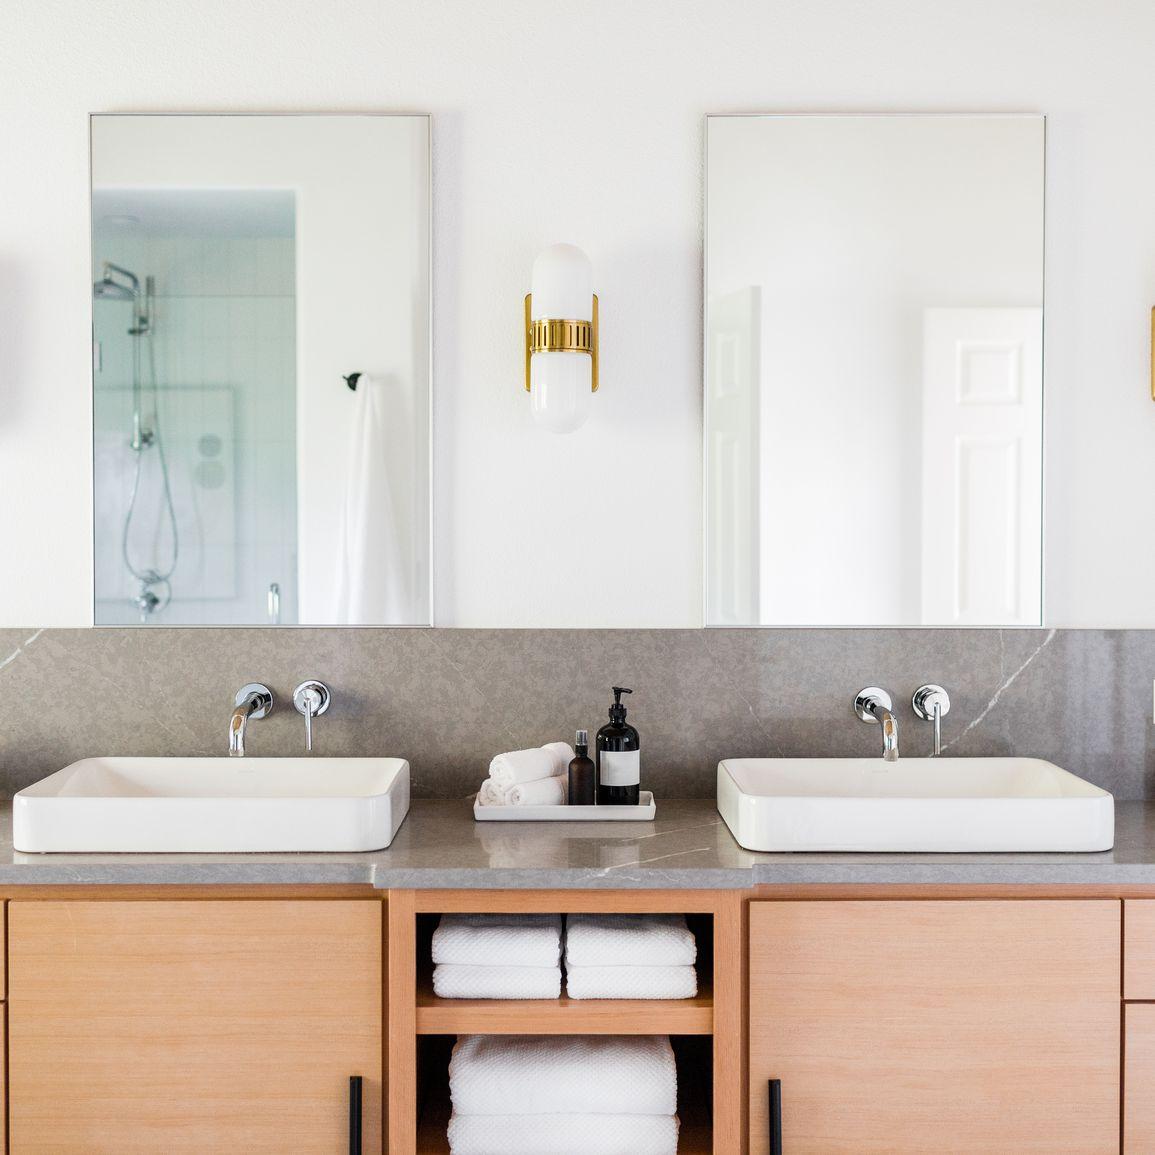 5 Cheap Bathroom Remodel Ideas